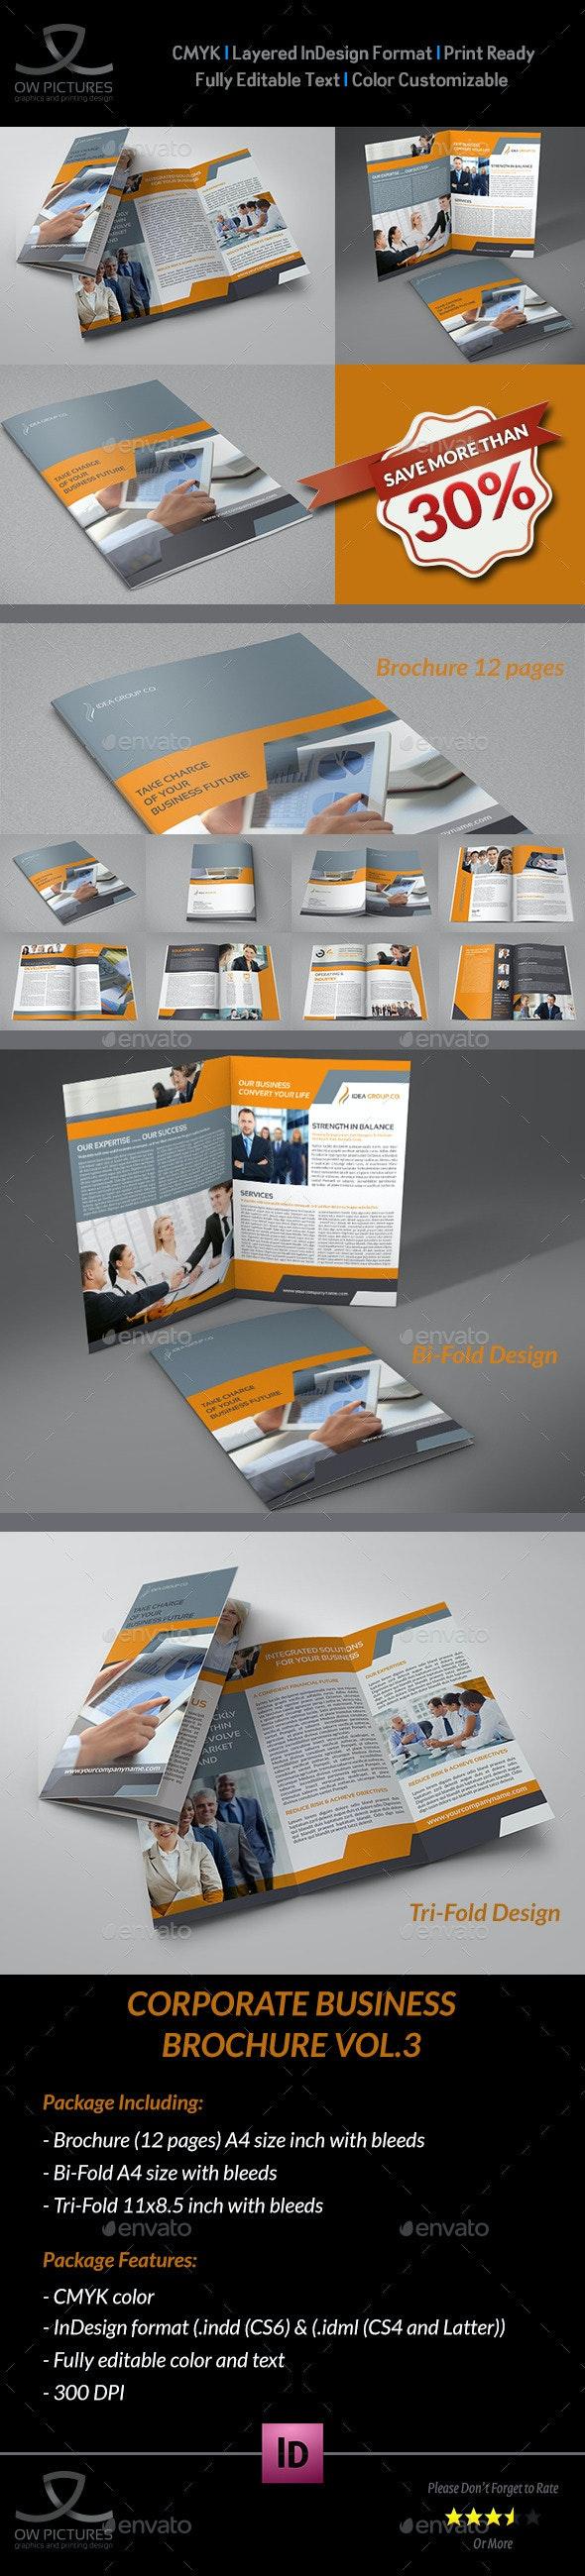 Company Brochure Bundle Vol.3 - Corporate Brochures